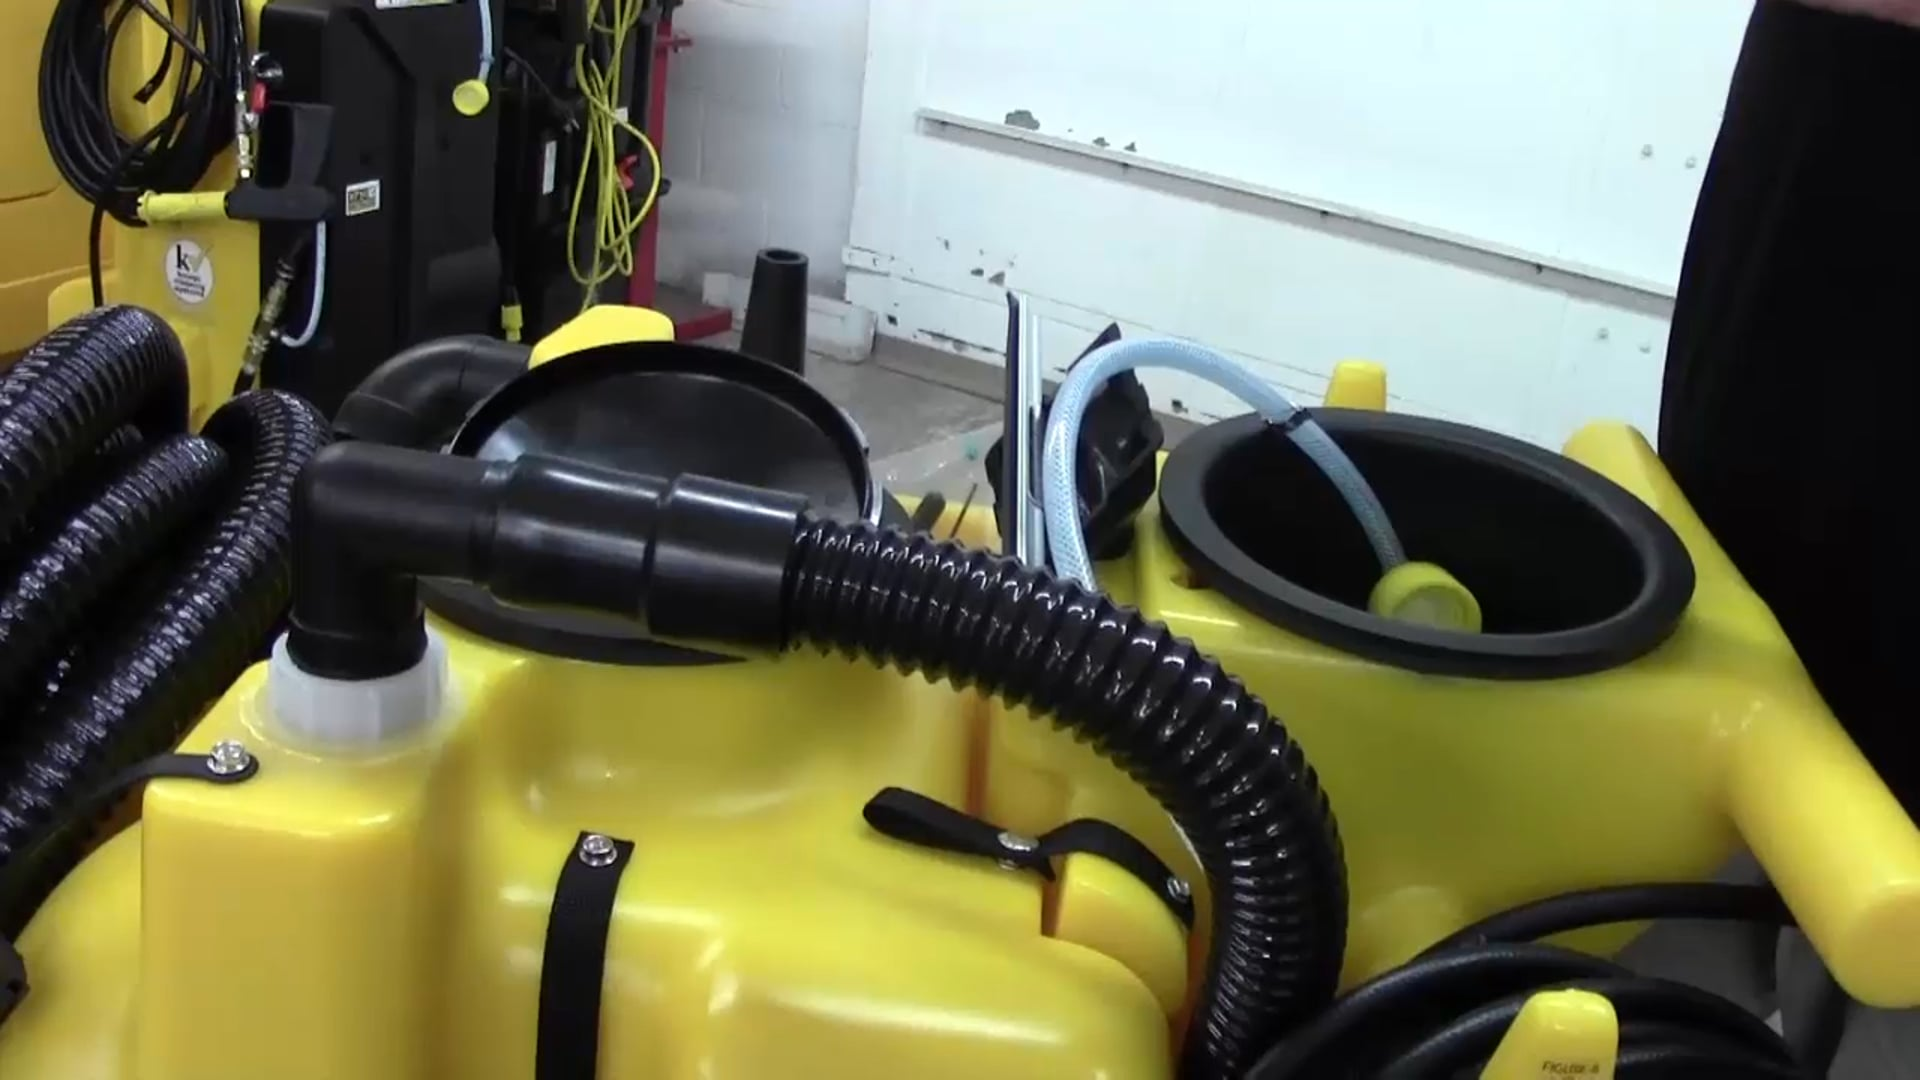 Vacuum Troubleshooting